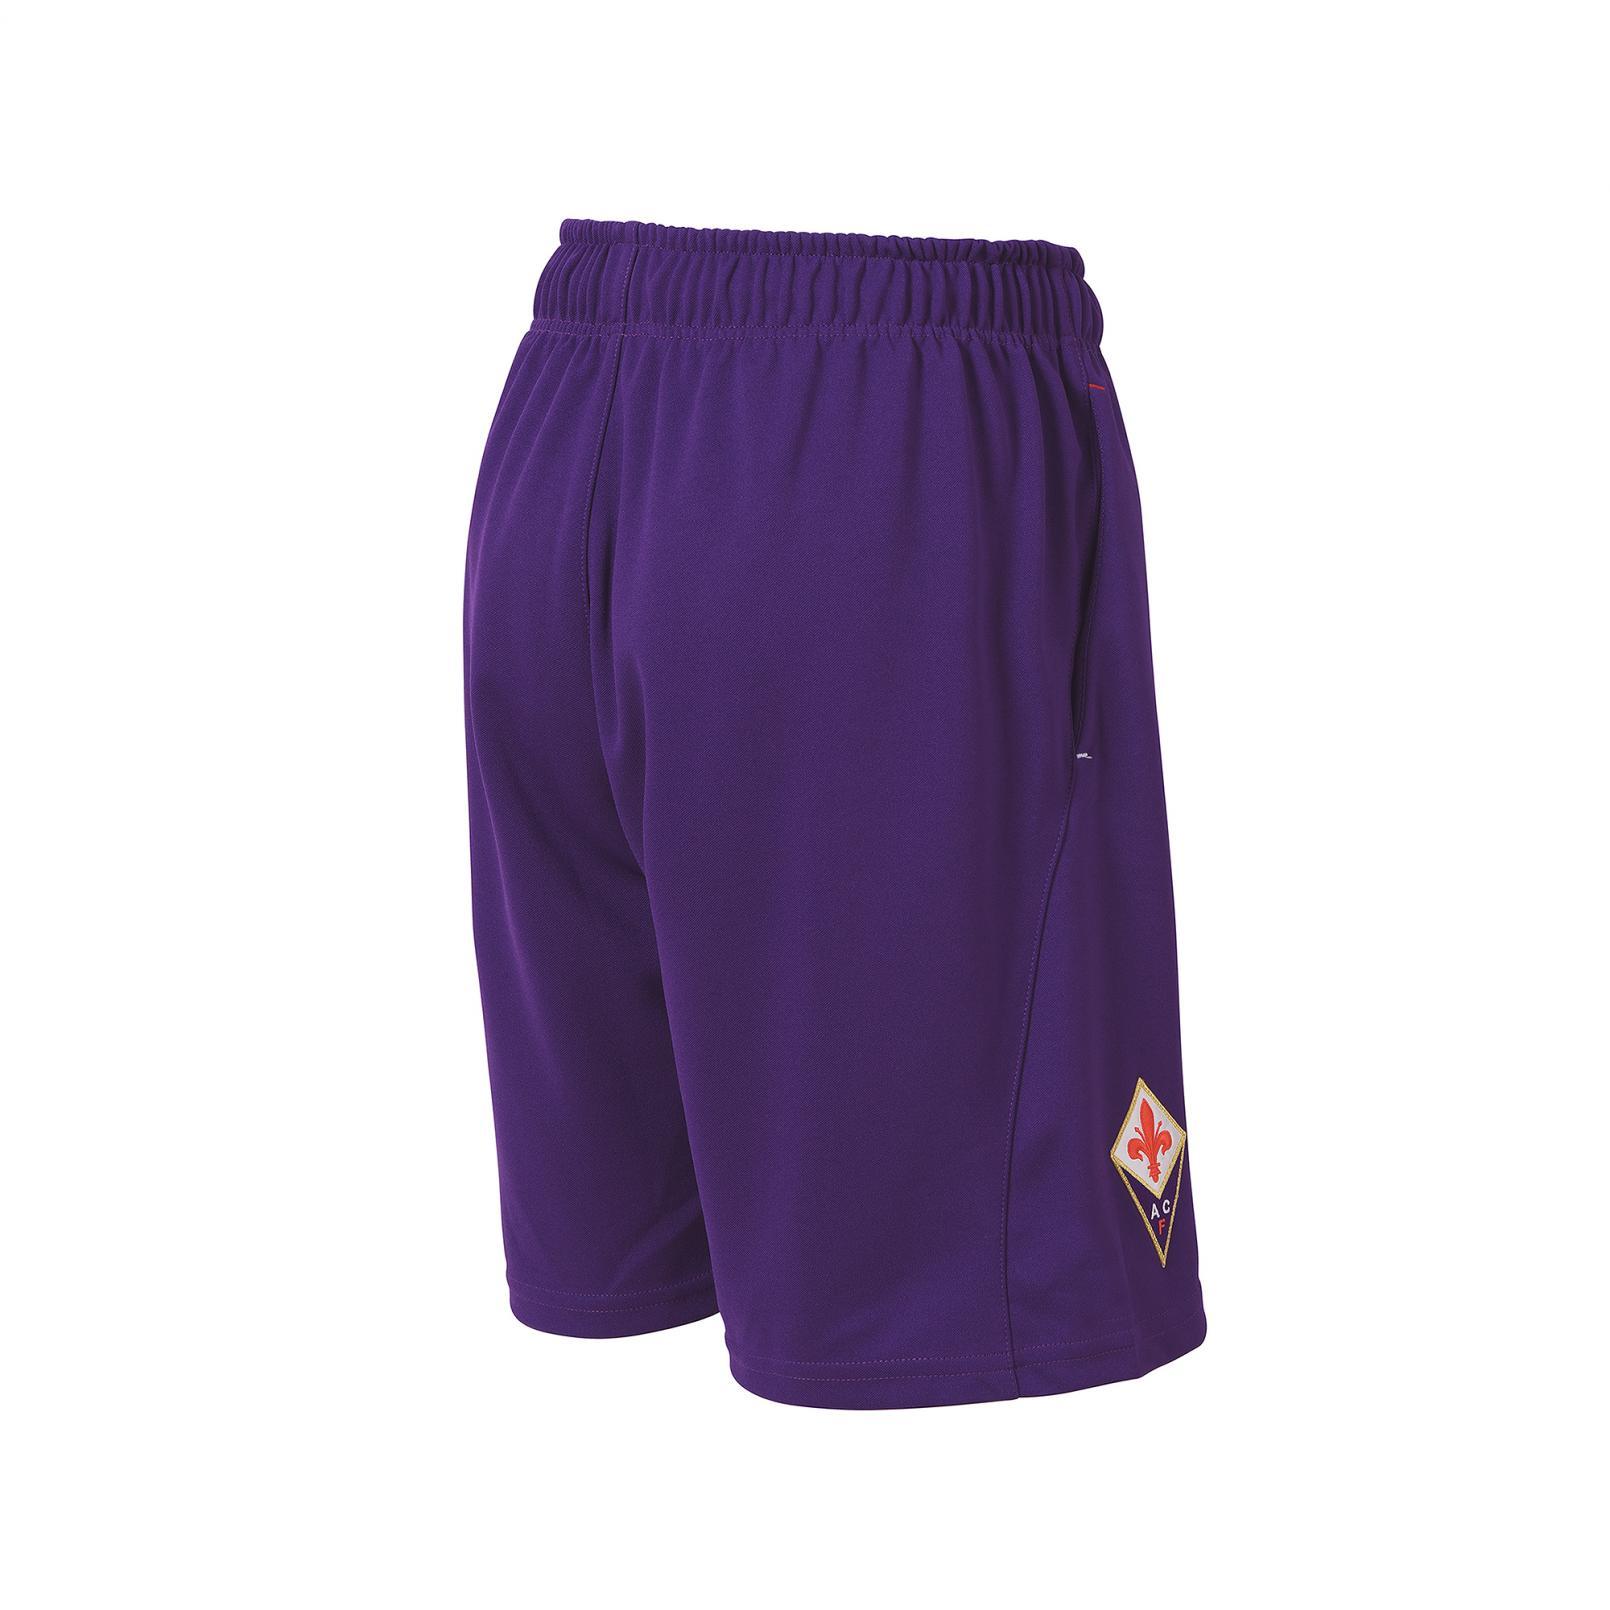 Kids Apparel – Le Coq Sportif Fiorentina Short Purple